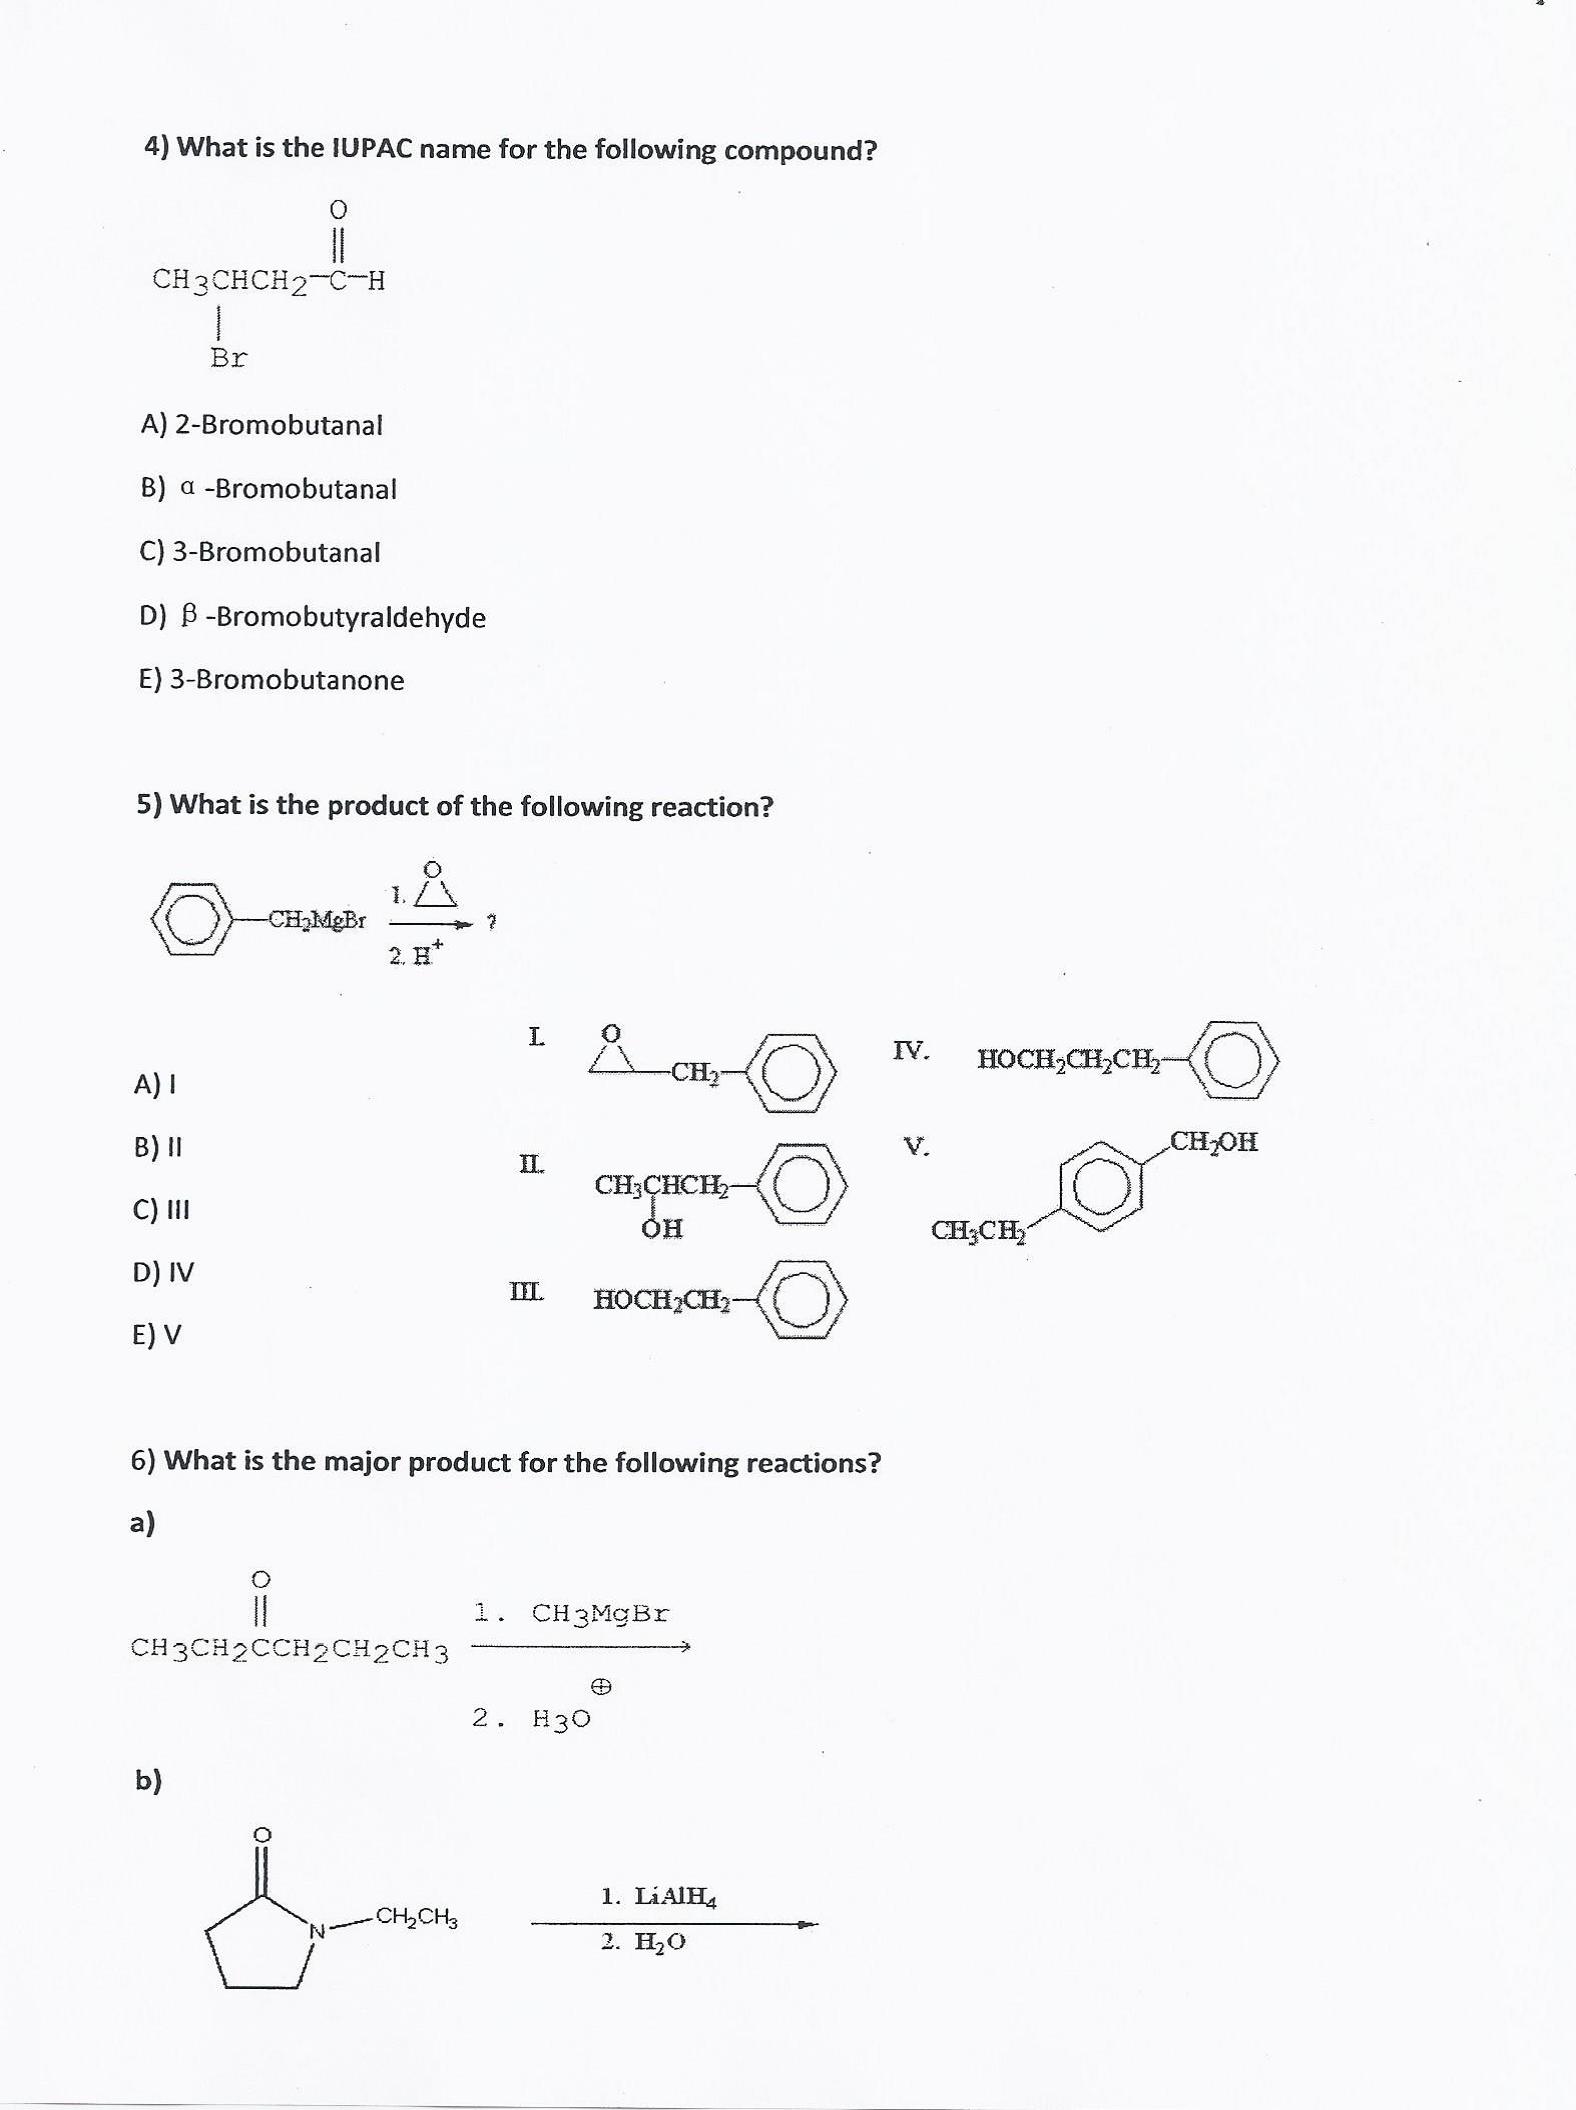 4 bromobutanone